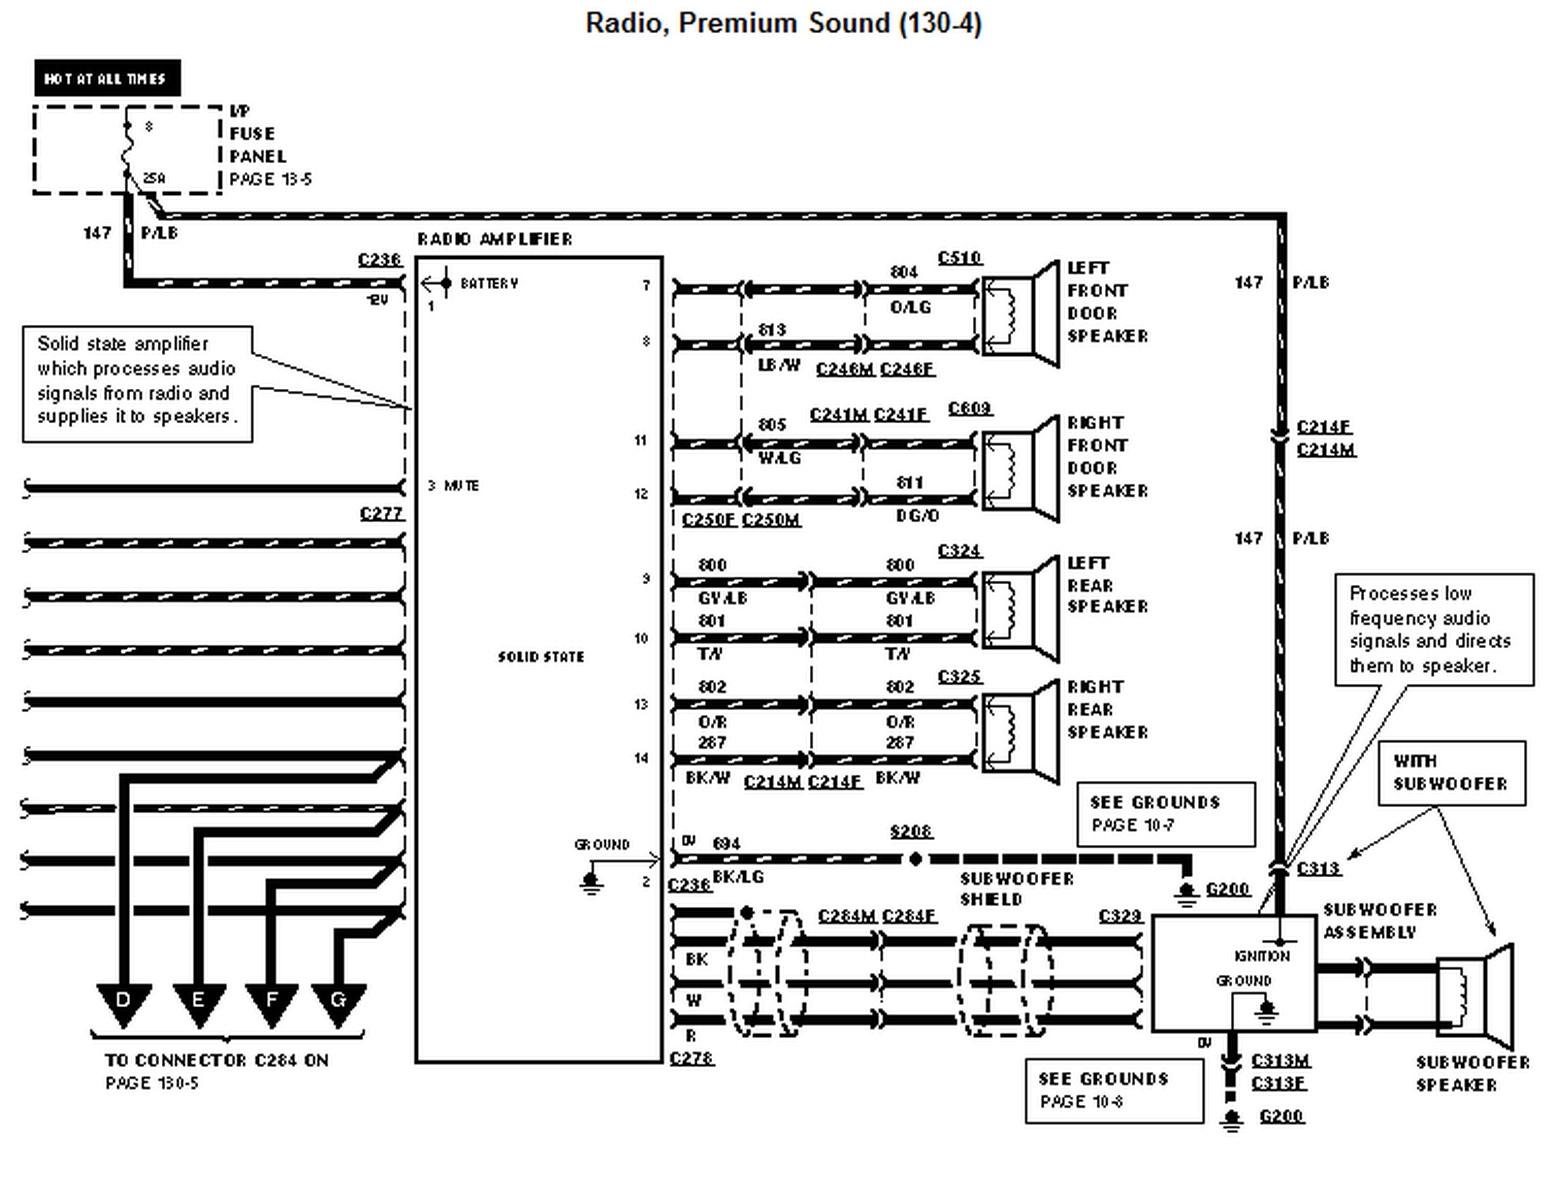 hight resolution of 1994 ford f150 radio wiring diagram 2005 ford stx f150 radio wiring diagram circuit diagram